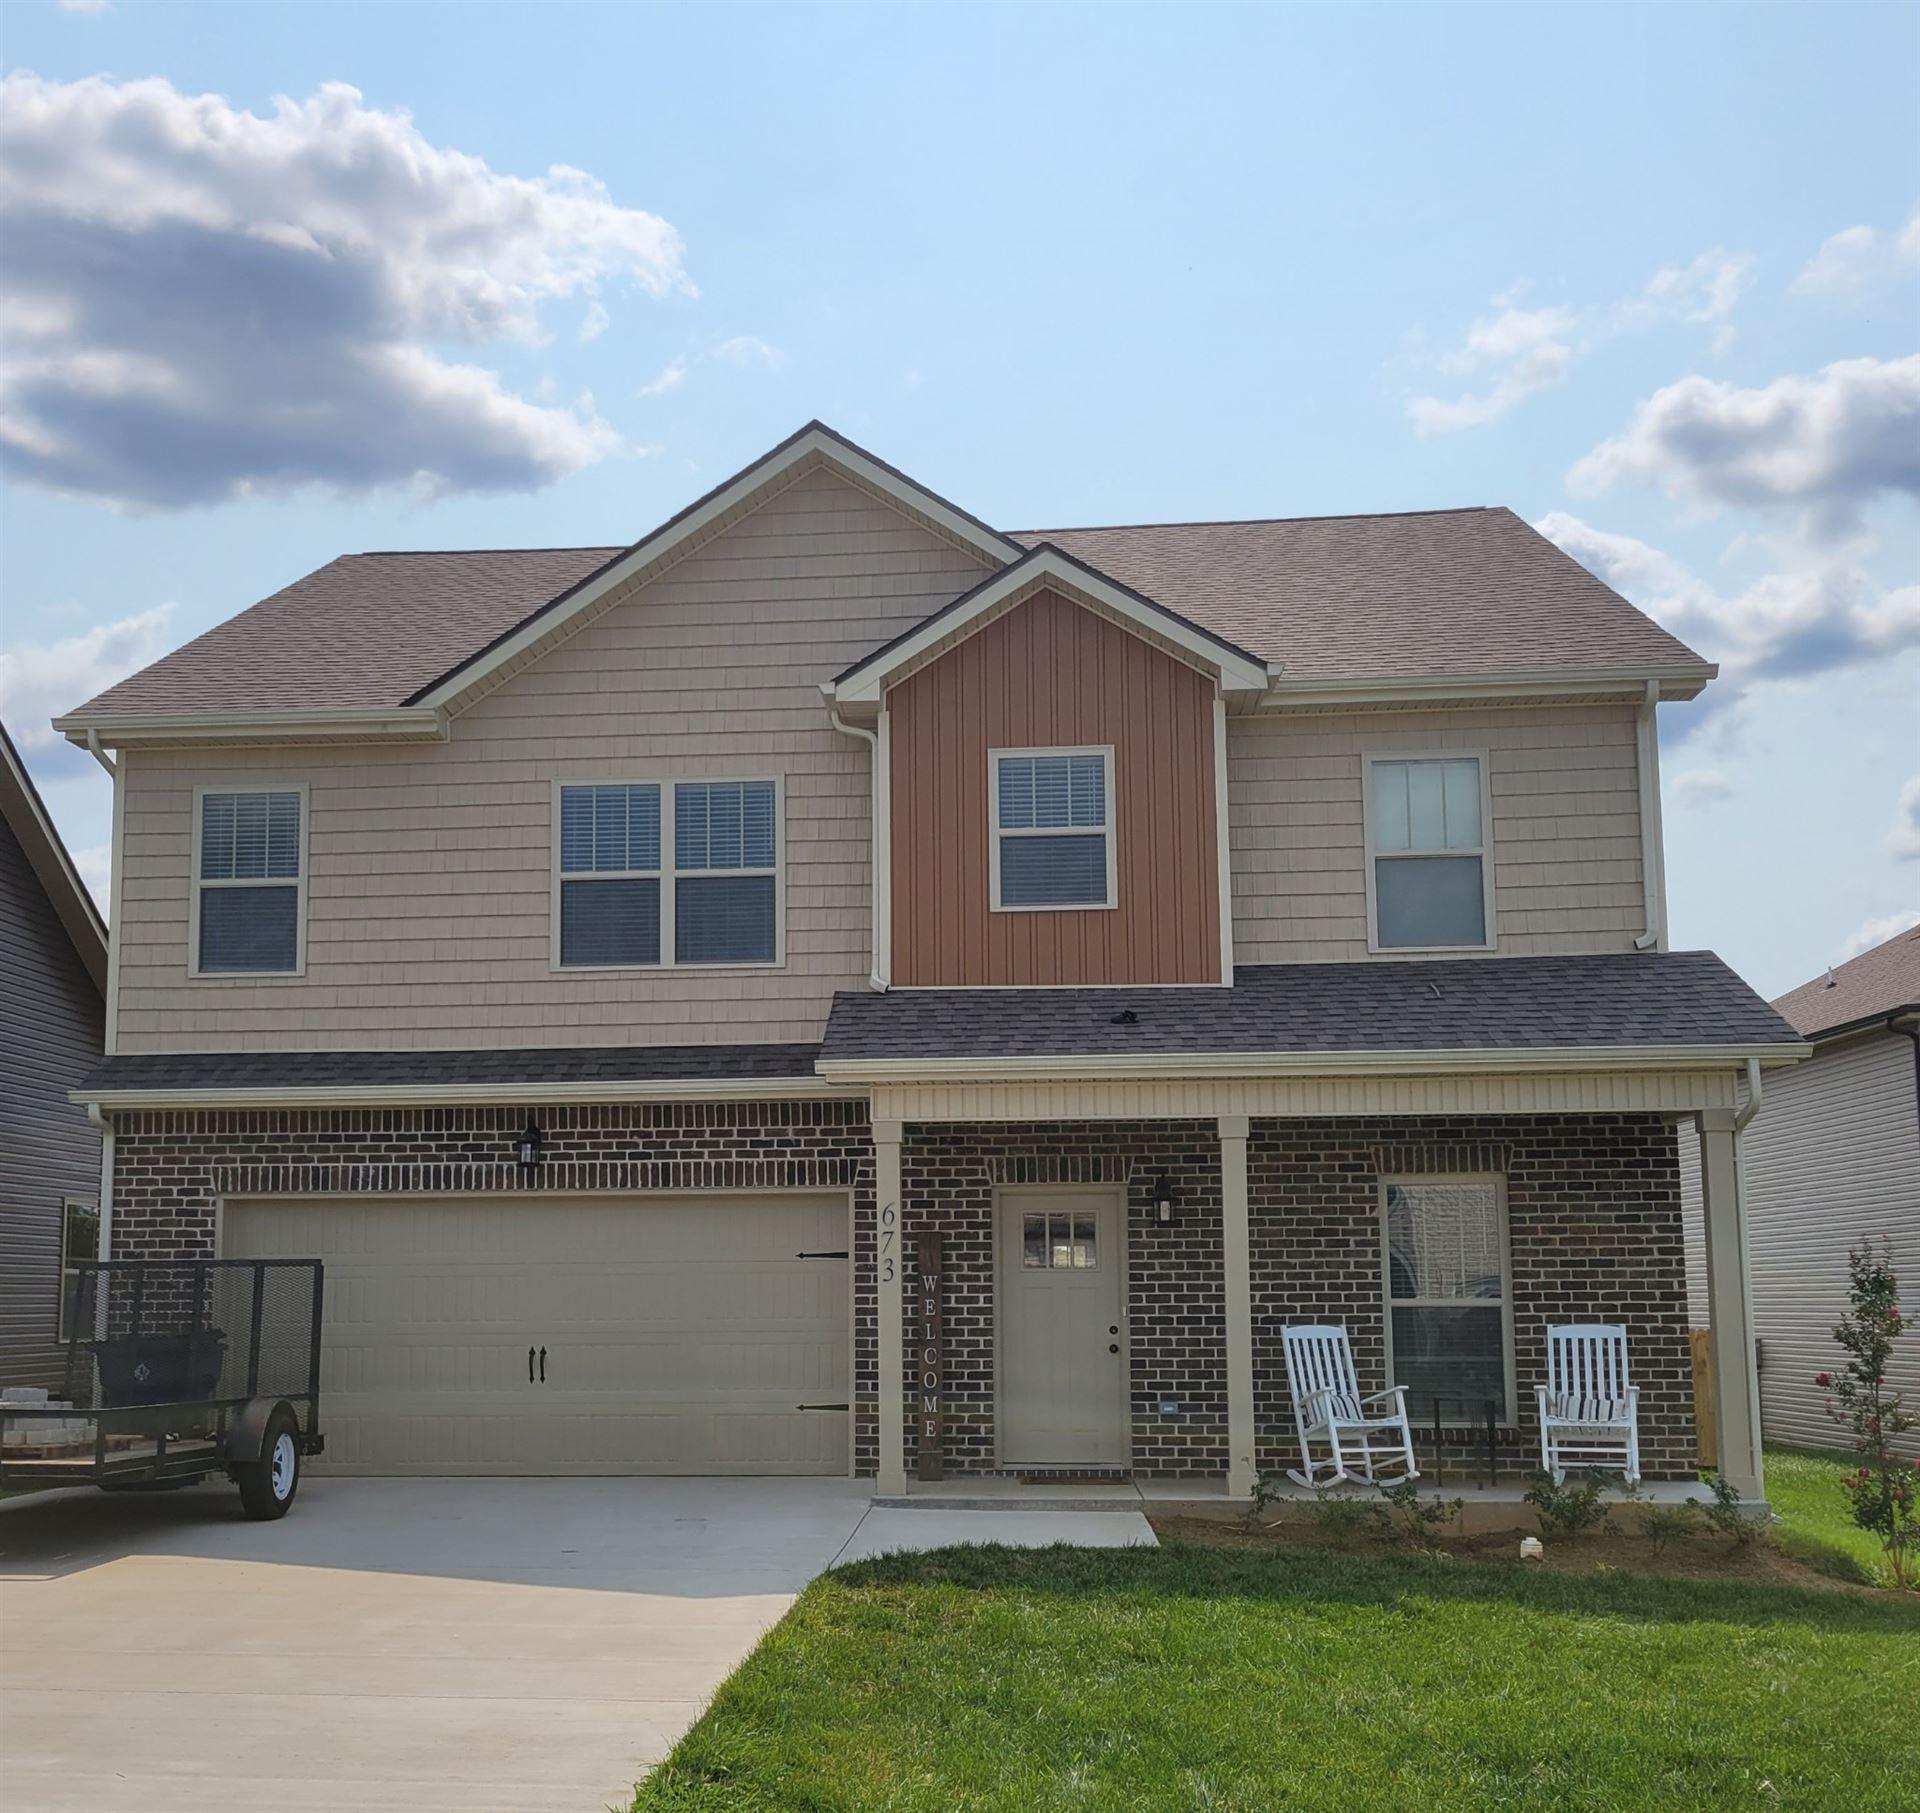 673 Elm St, Clarksville, TN 37040 - MLS#: 2288969